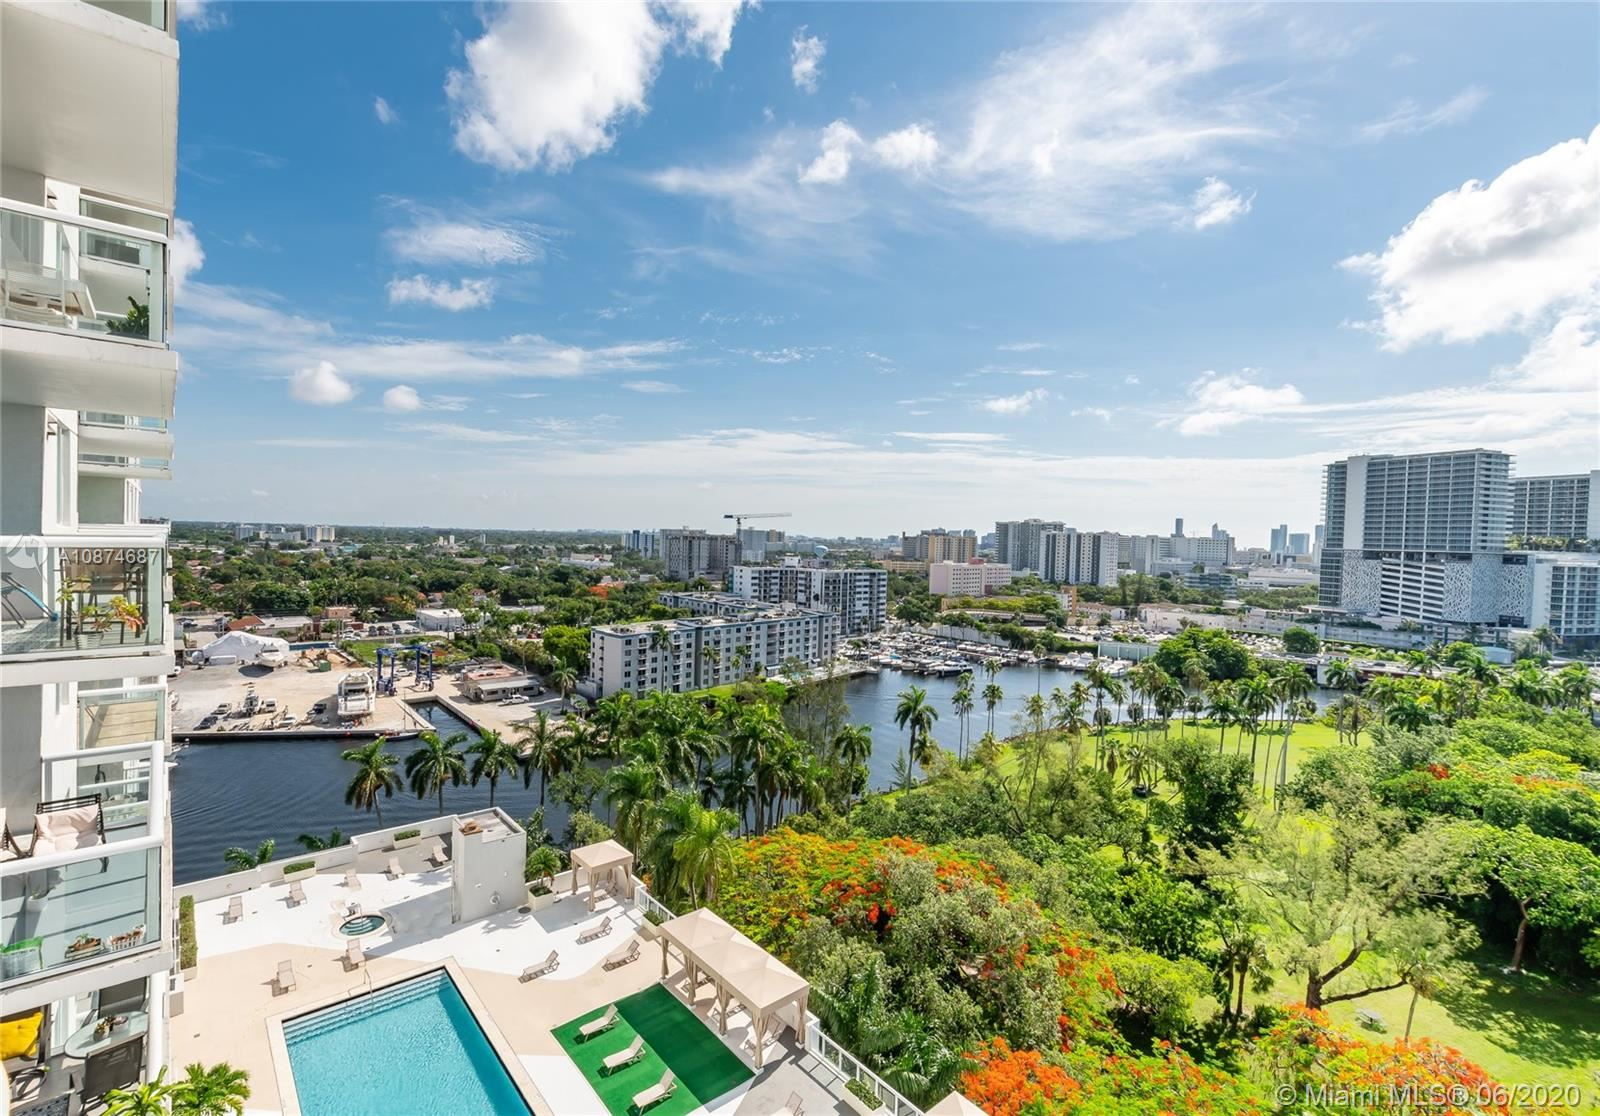 1861 NW South River Dr #1610, Miami, FL 33125 - #: A10874687